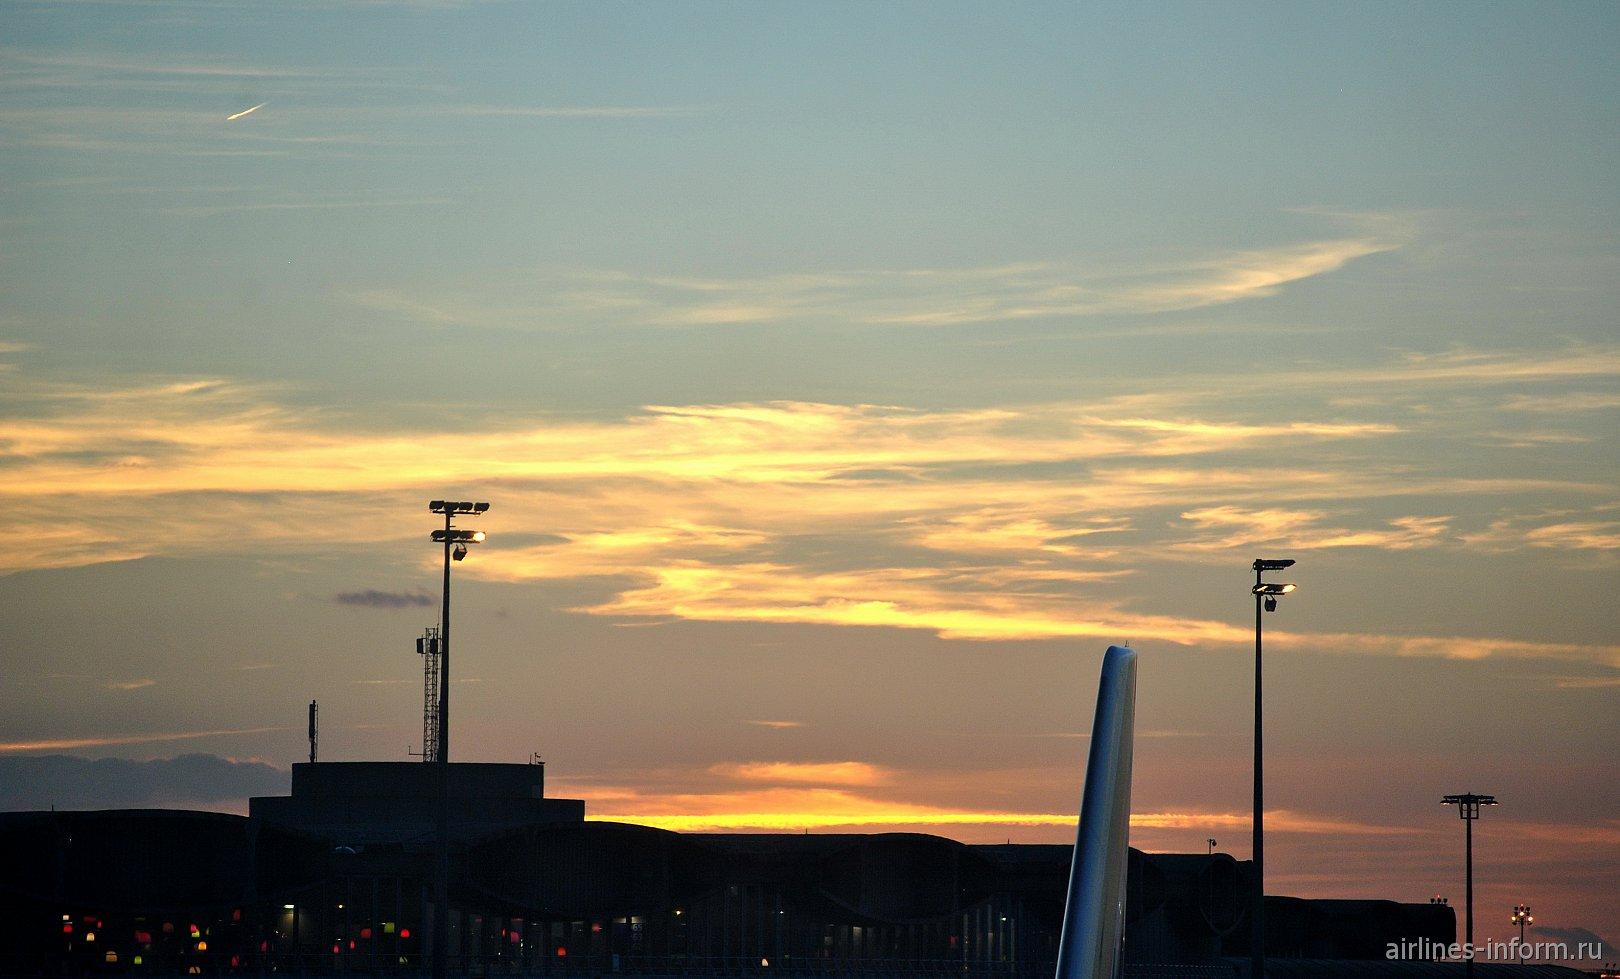 Закат в аэропорту Париж Шарль-де-Голль